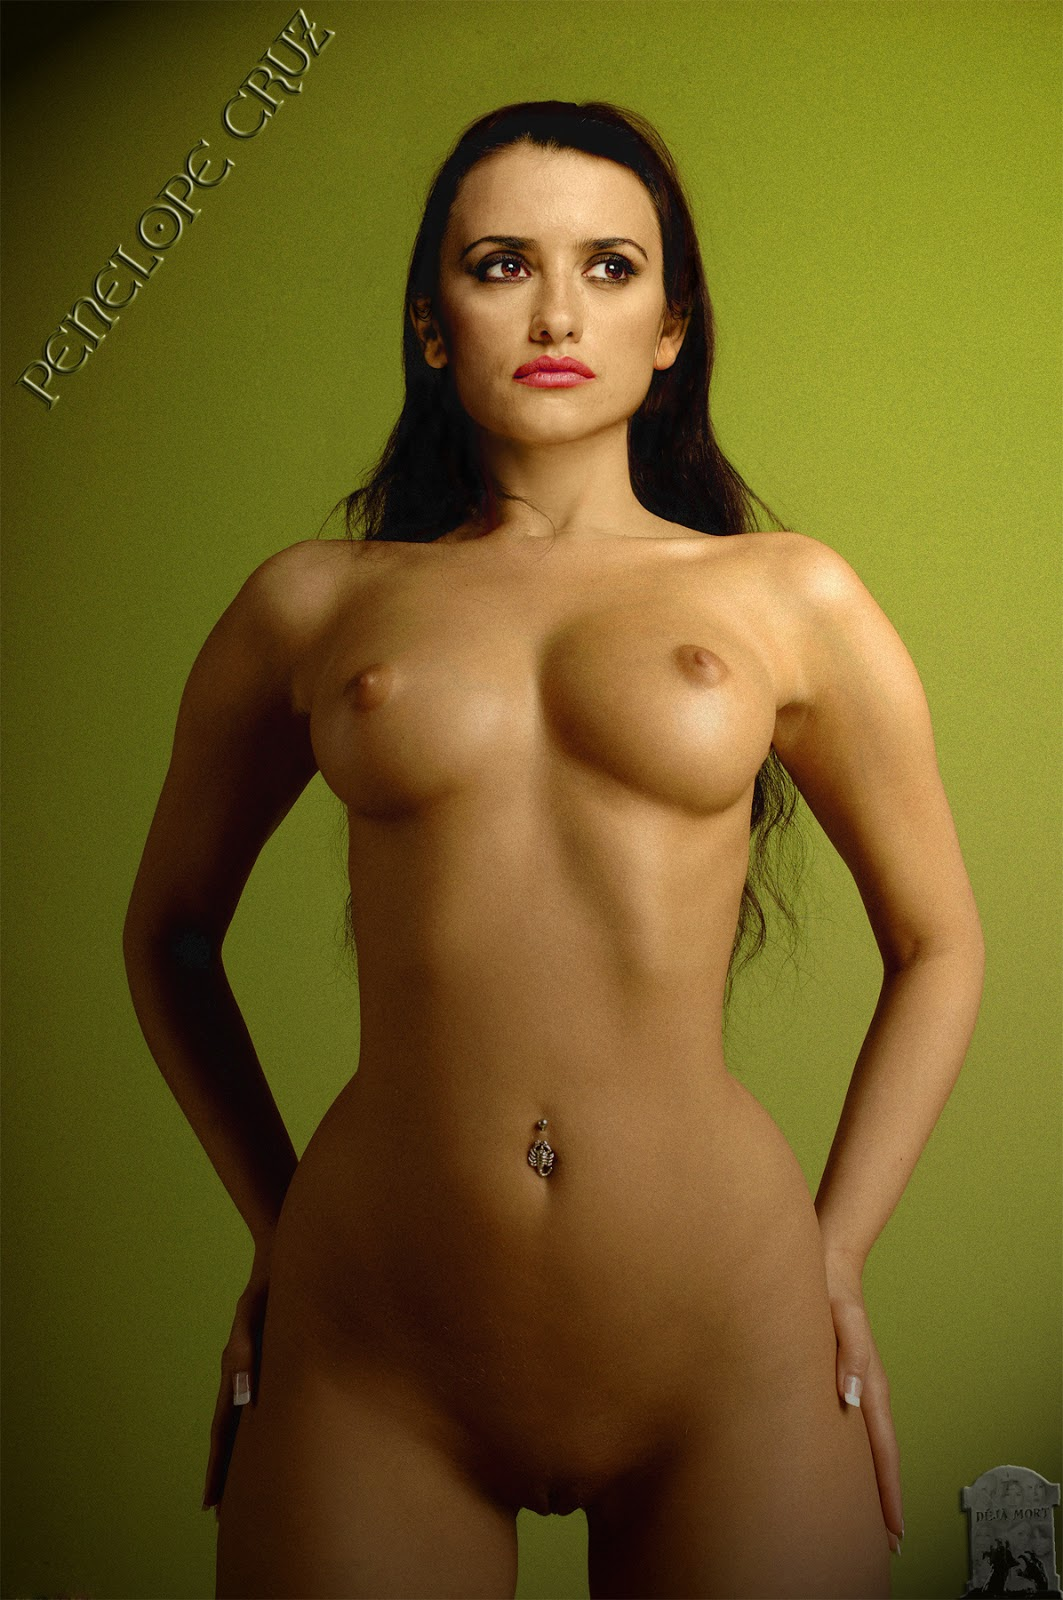 hot desi girls village nude girls photos